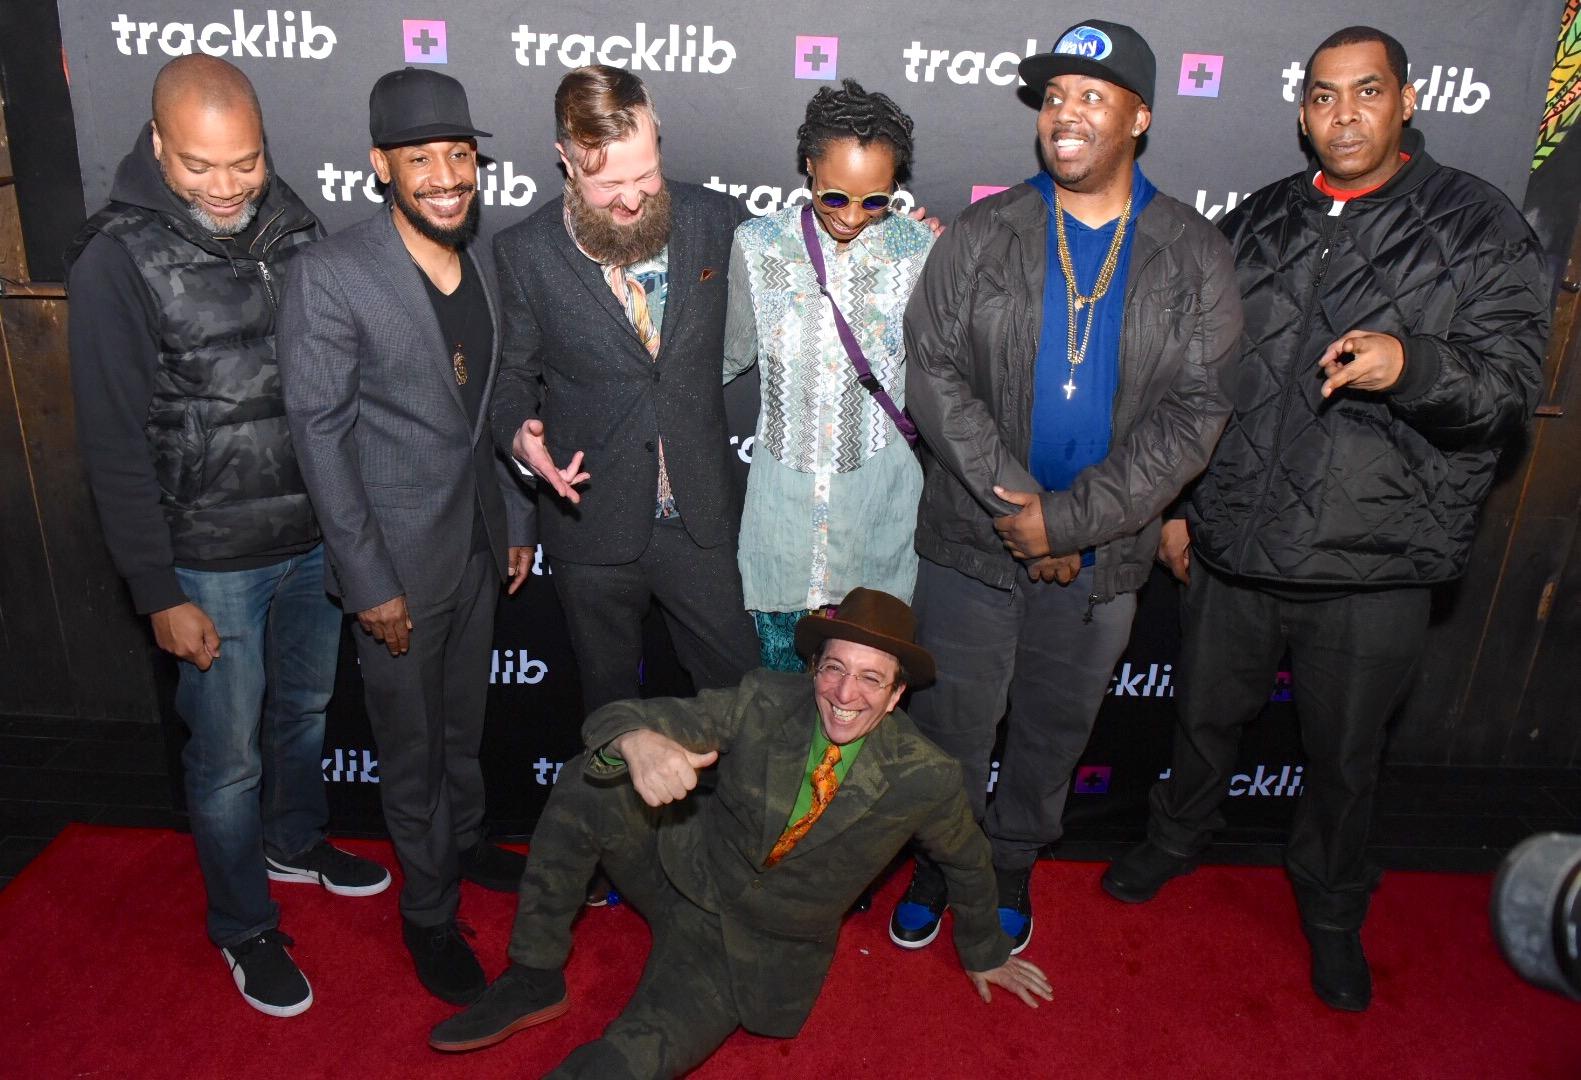 Recap of Tracklib NYC Launch Party - Urban Magazine